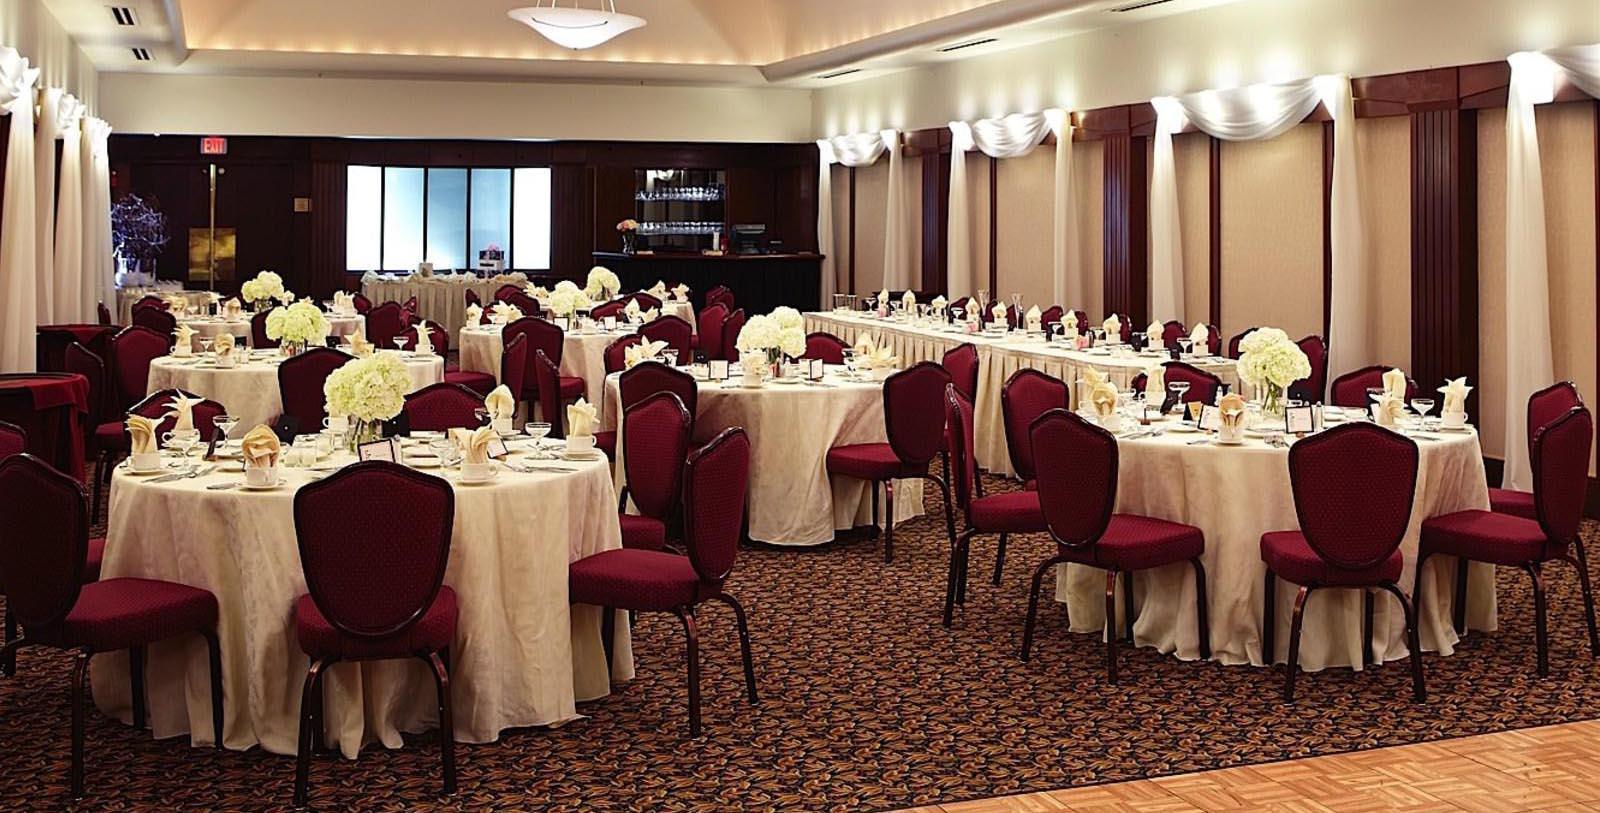 Image of Event Space Portland Regency Hotel & Spa, 1895, Member of Historic Hotels of America, in Portland Maine, Taste